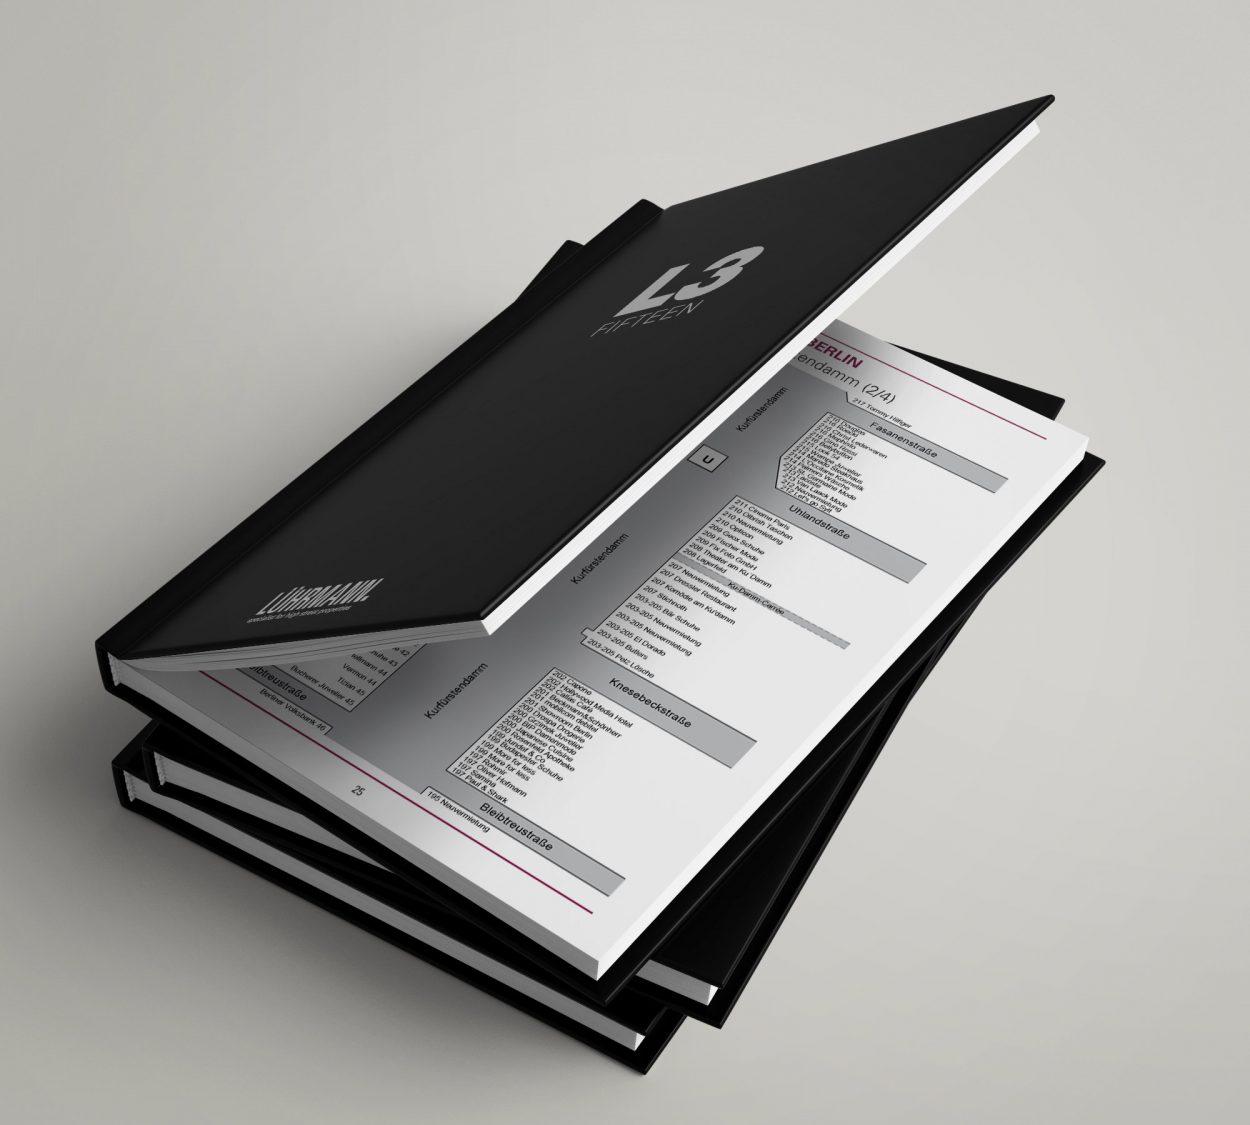 Lührmann-L3-Buch-offen